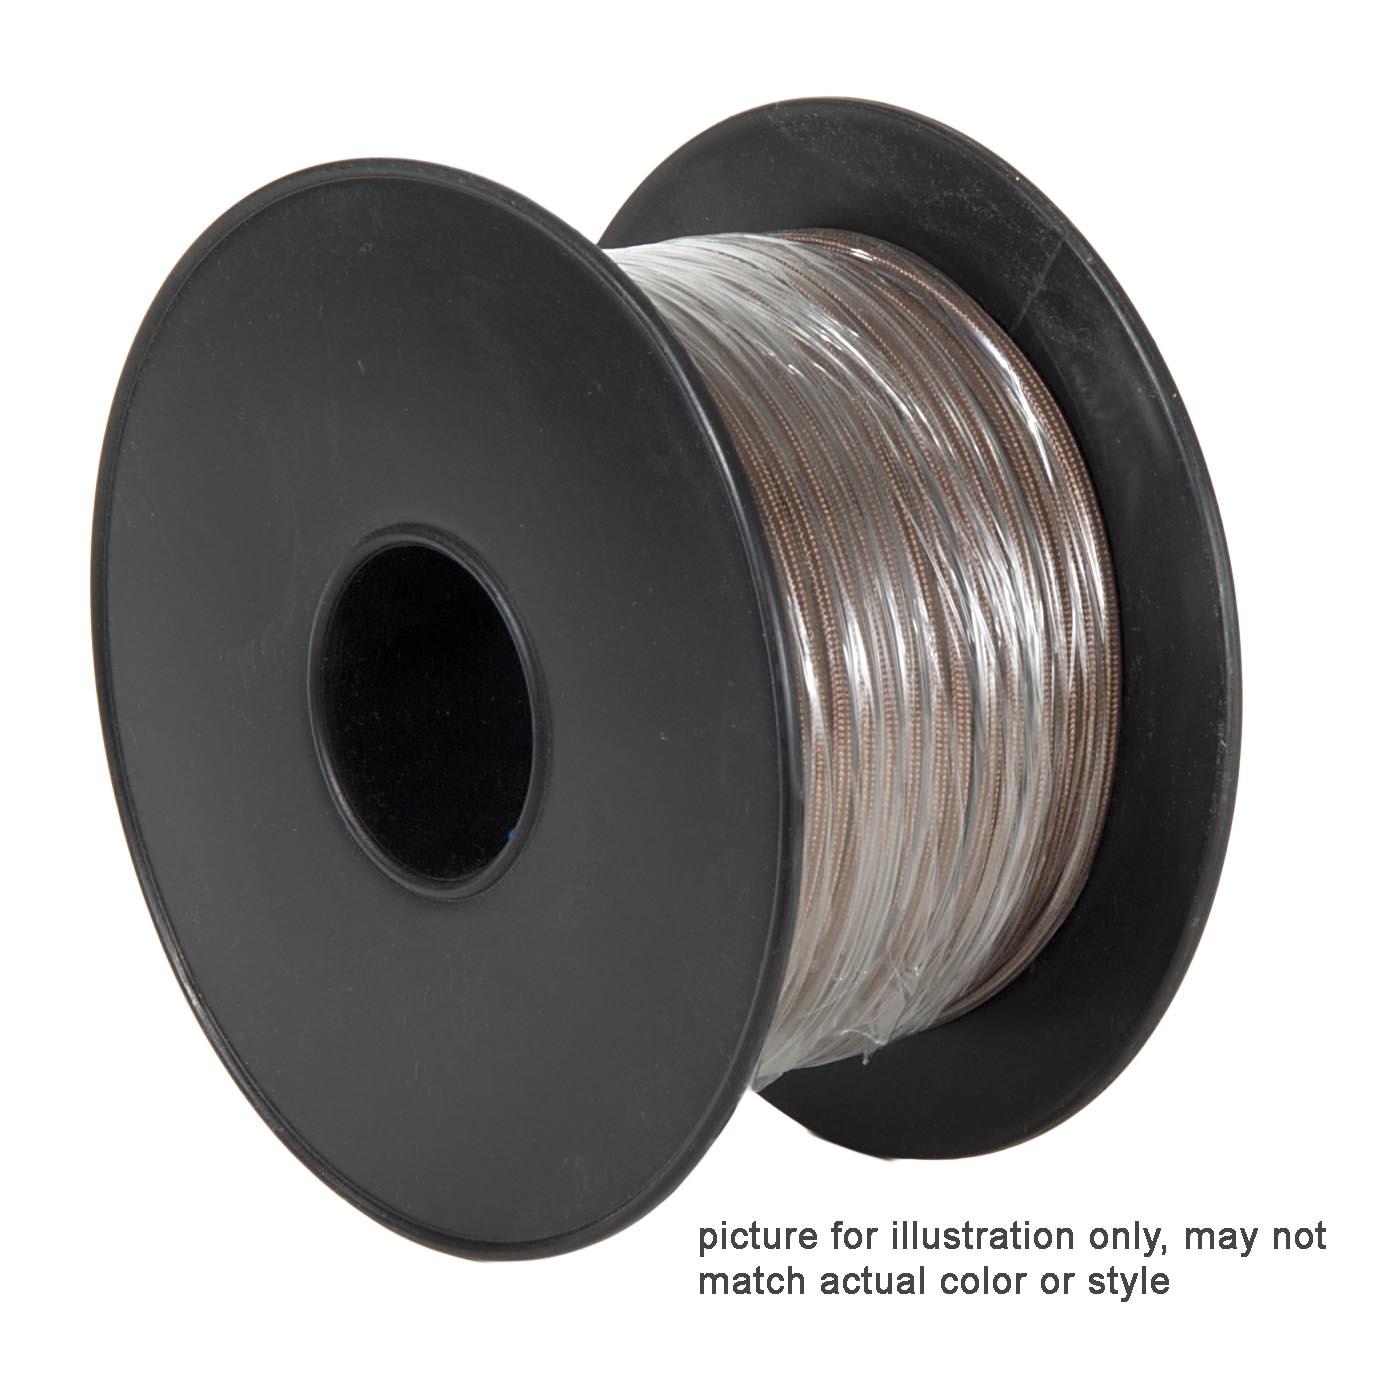 White PVC 2-wire Heavy Duty SJT <br>Spooled Lamp Cord 46624 | B&P ...